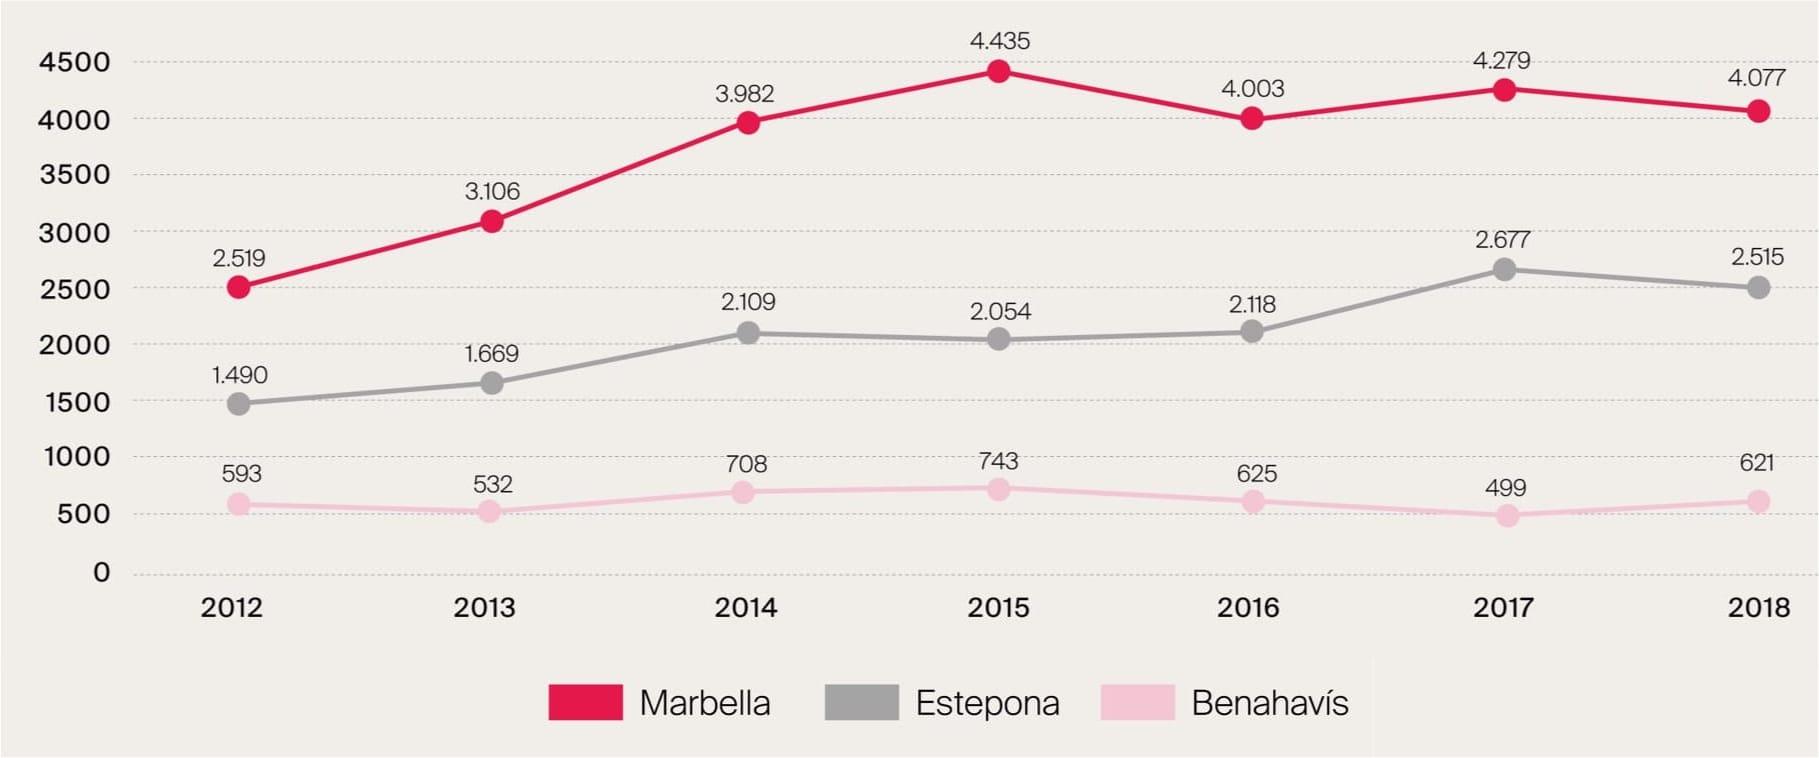 Property sales 2012-2018* by municipality